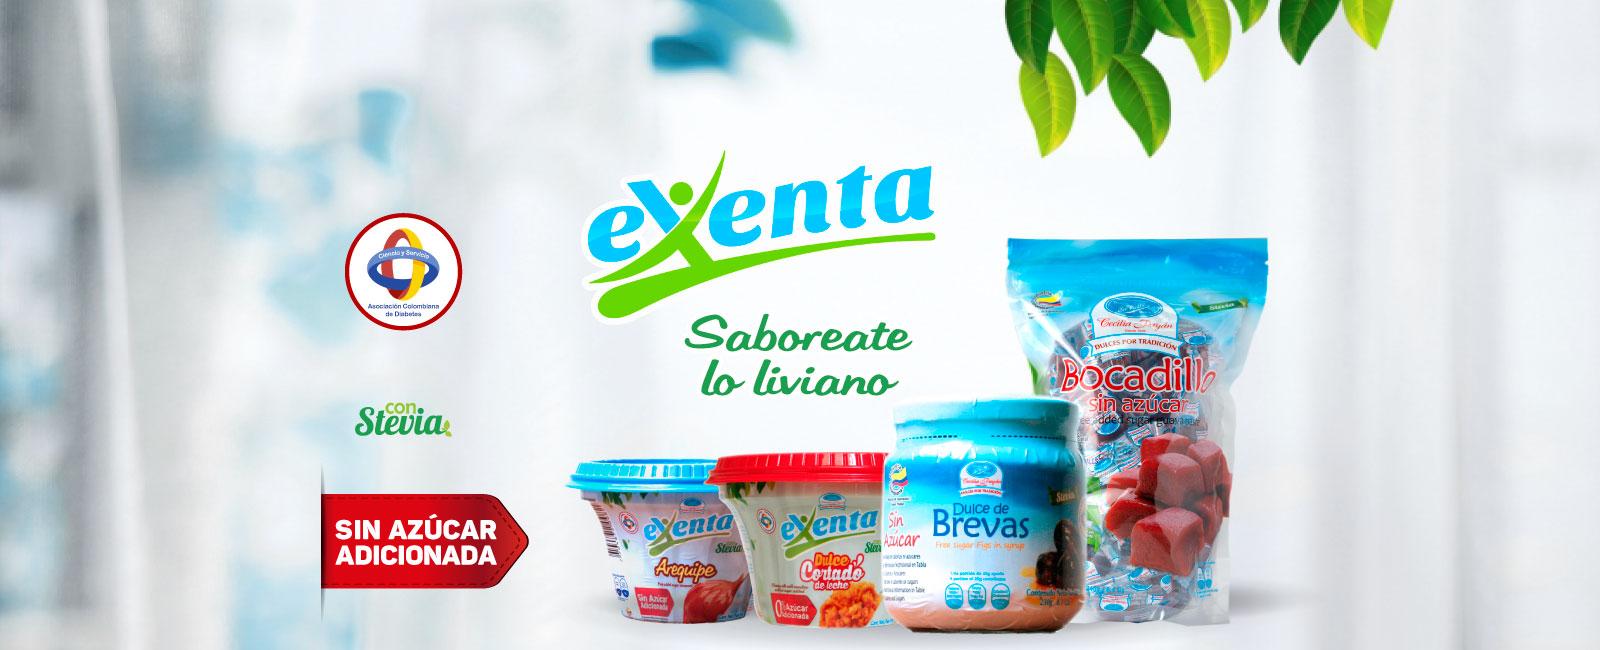 Linea Cero - Exenta